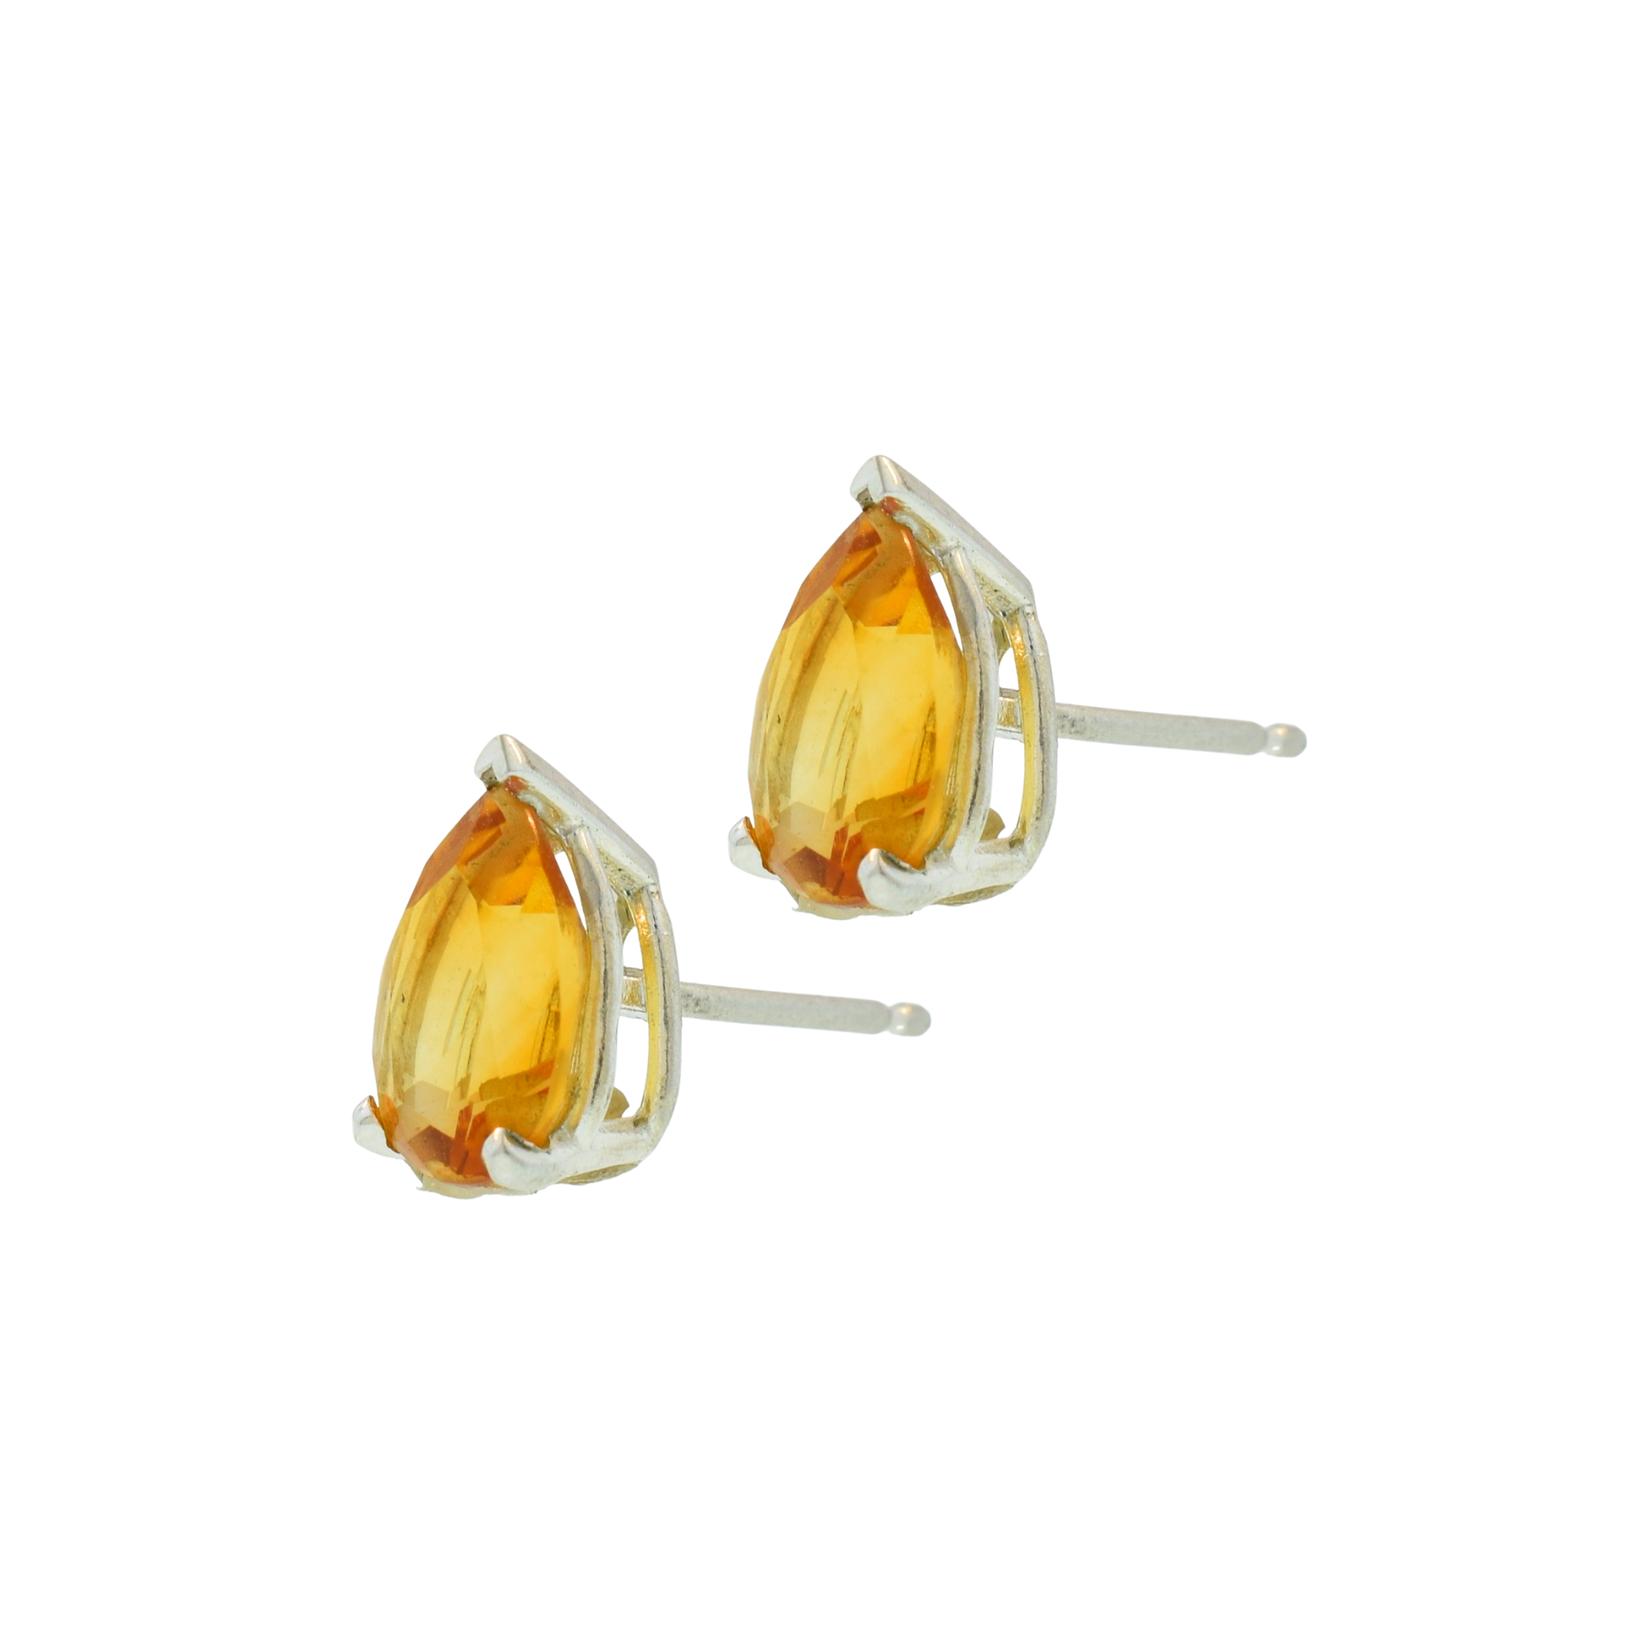 Pear Citrine Stud Earrings